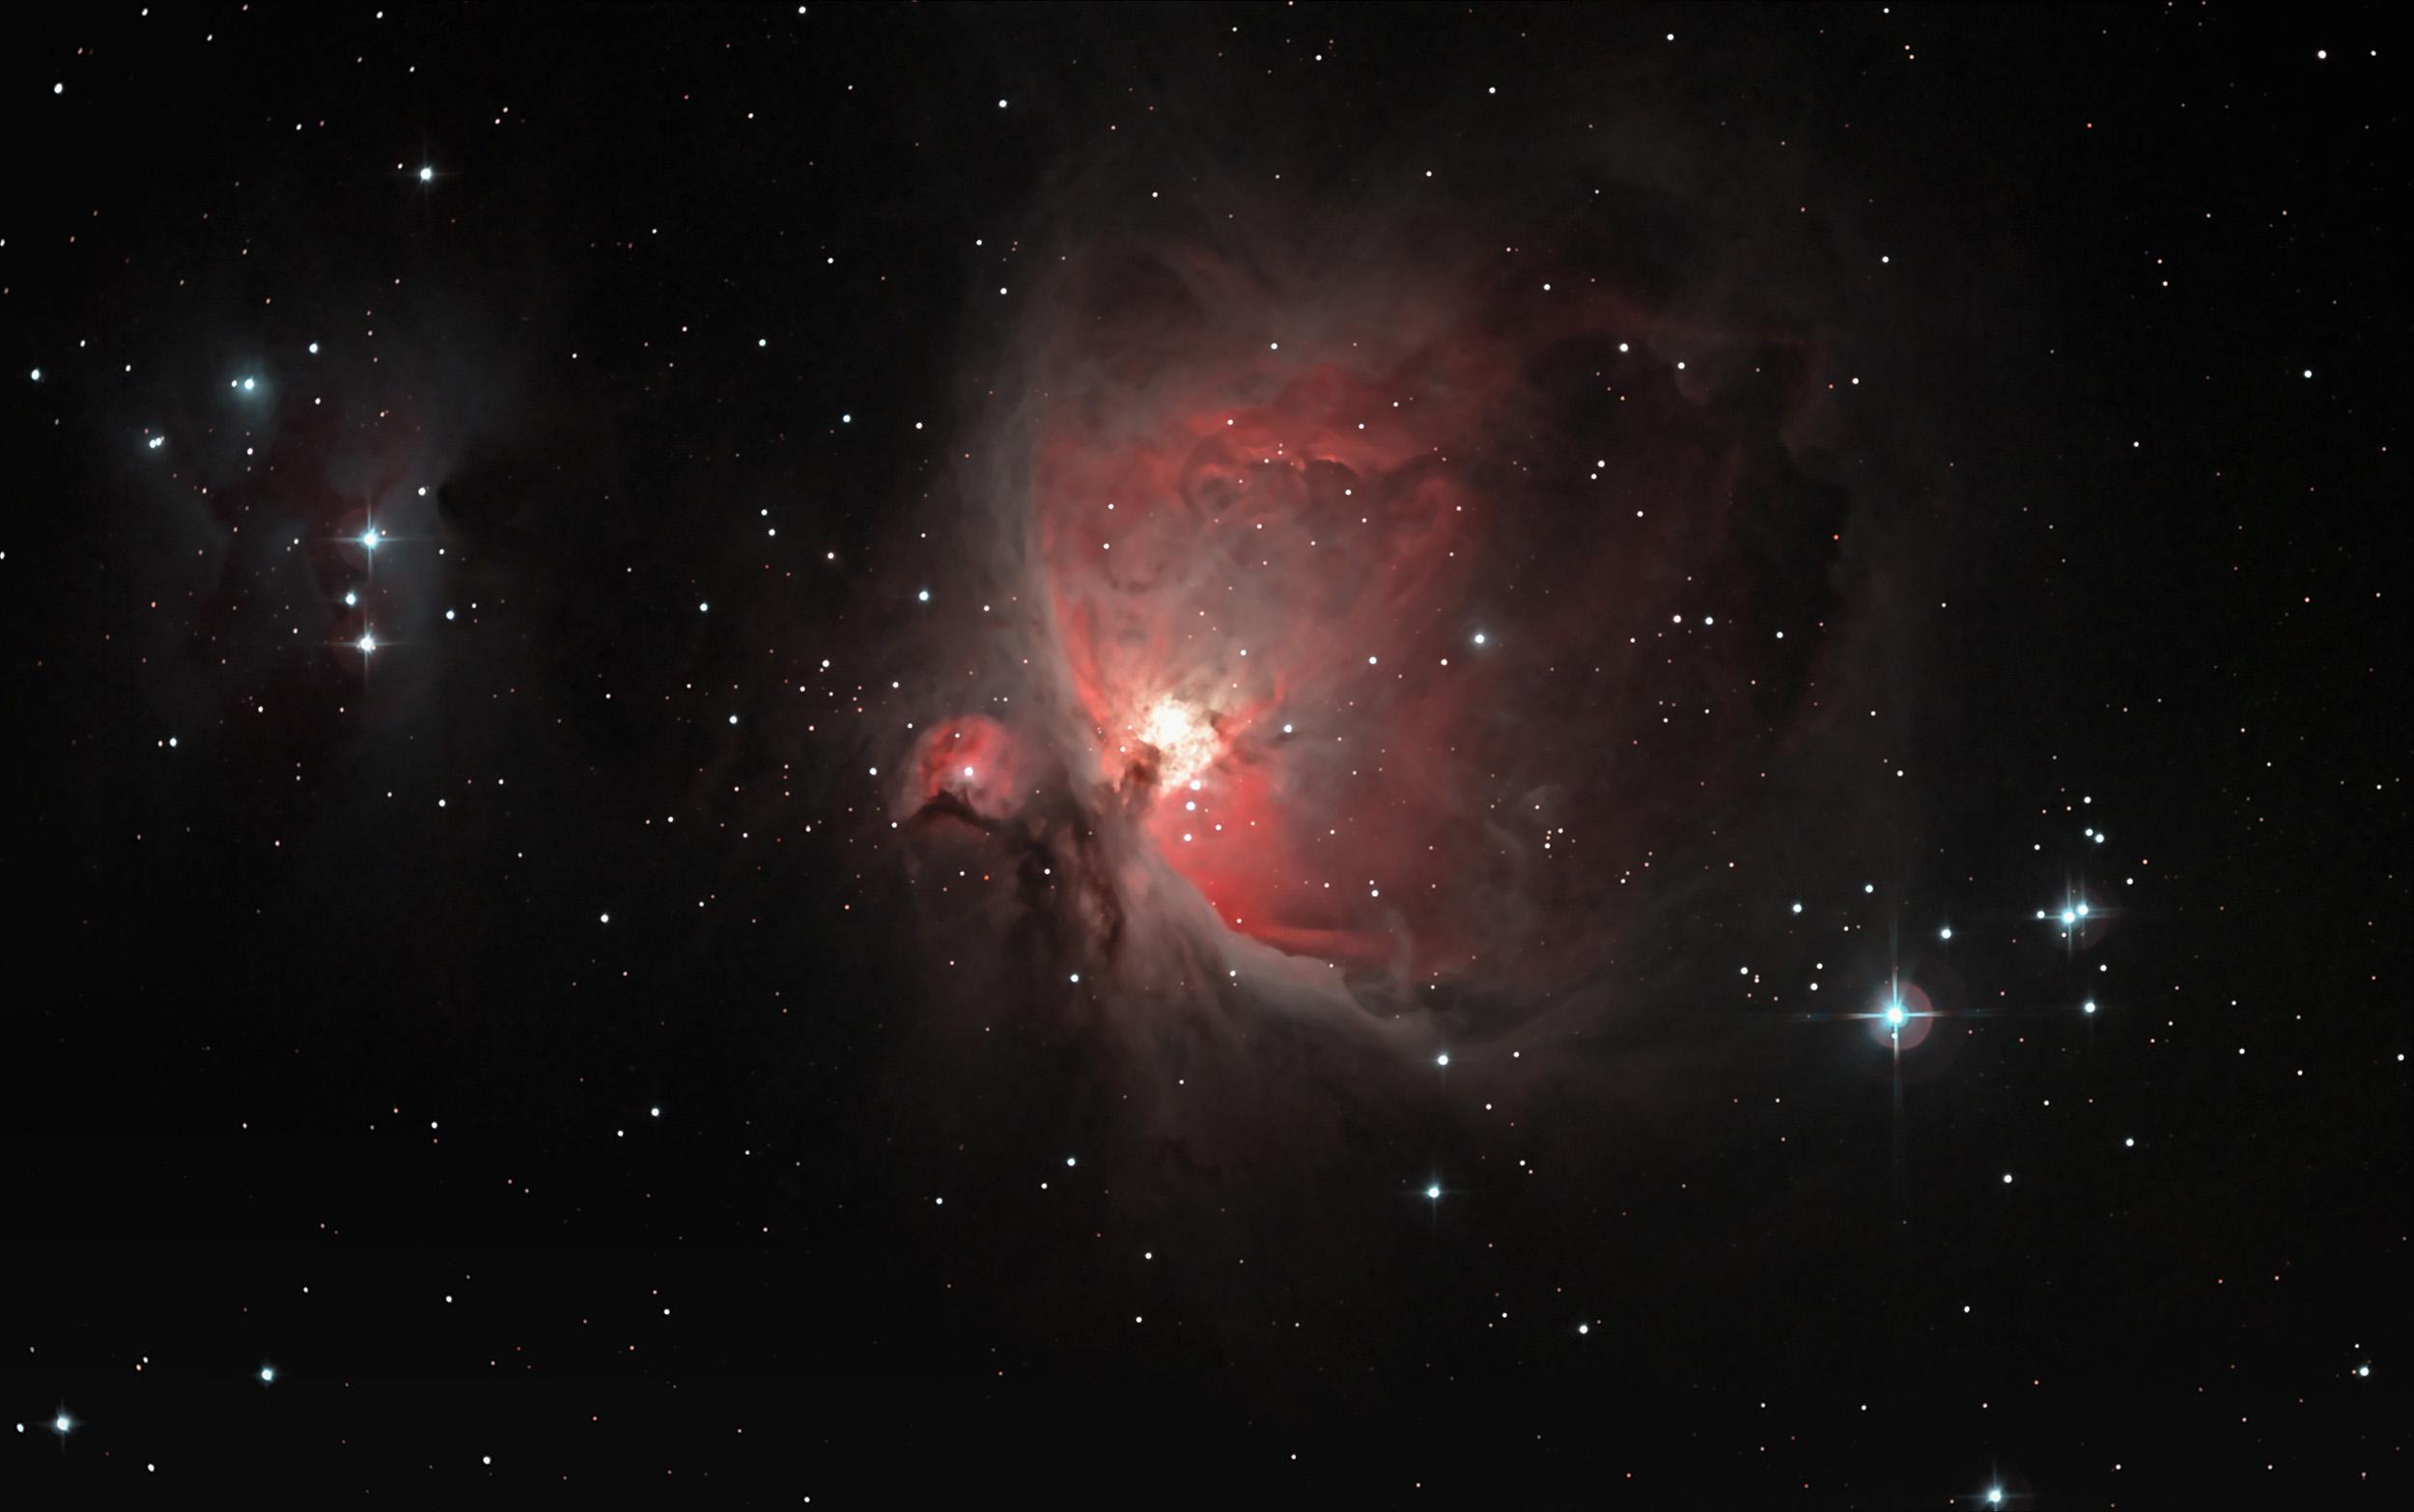 Orion Nebula Images Wallpaper HD obuum1d2jz   ARASPOTcom 2500x1566